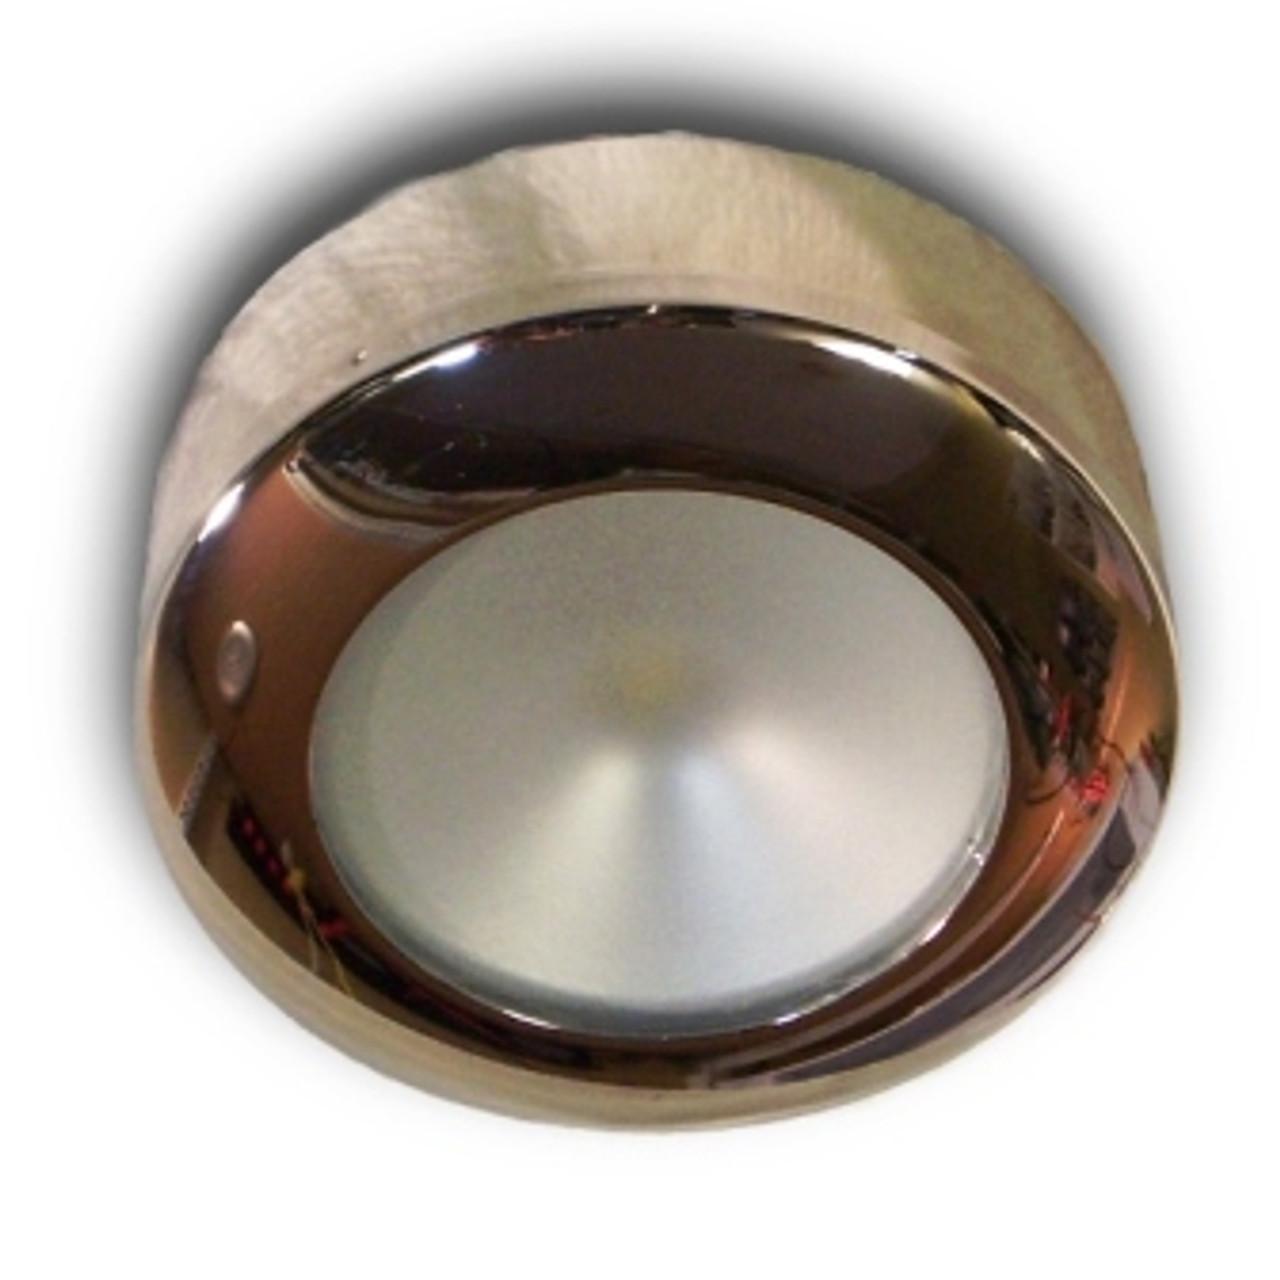 Polished Hi-Line Stainless Steel LED Puck Light